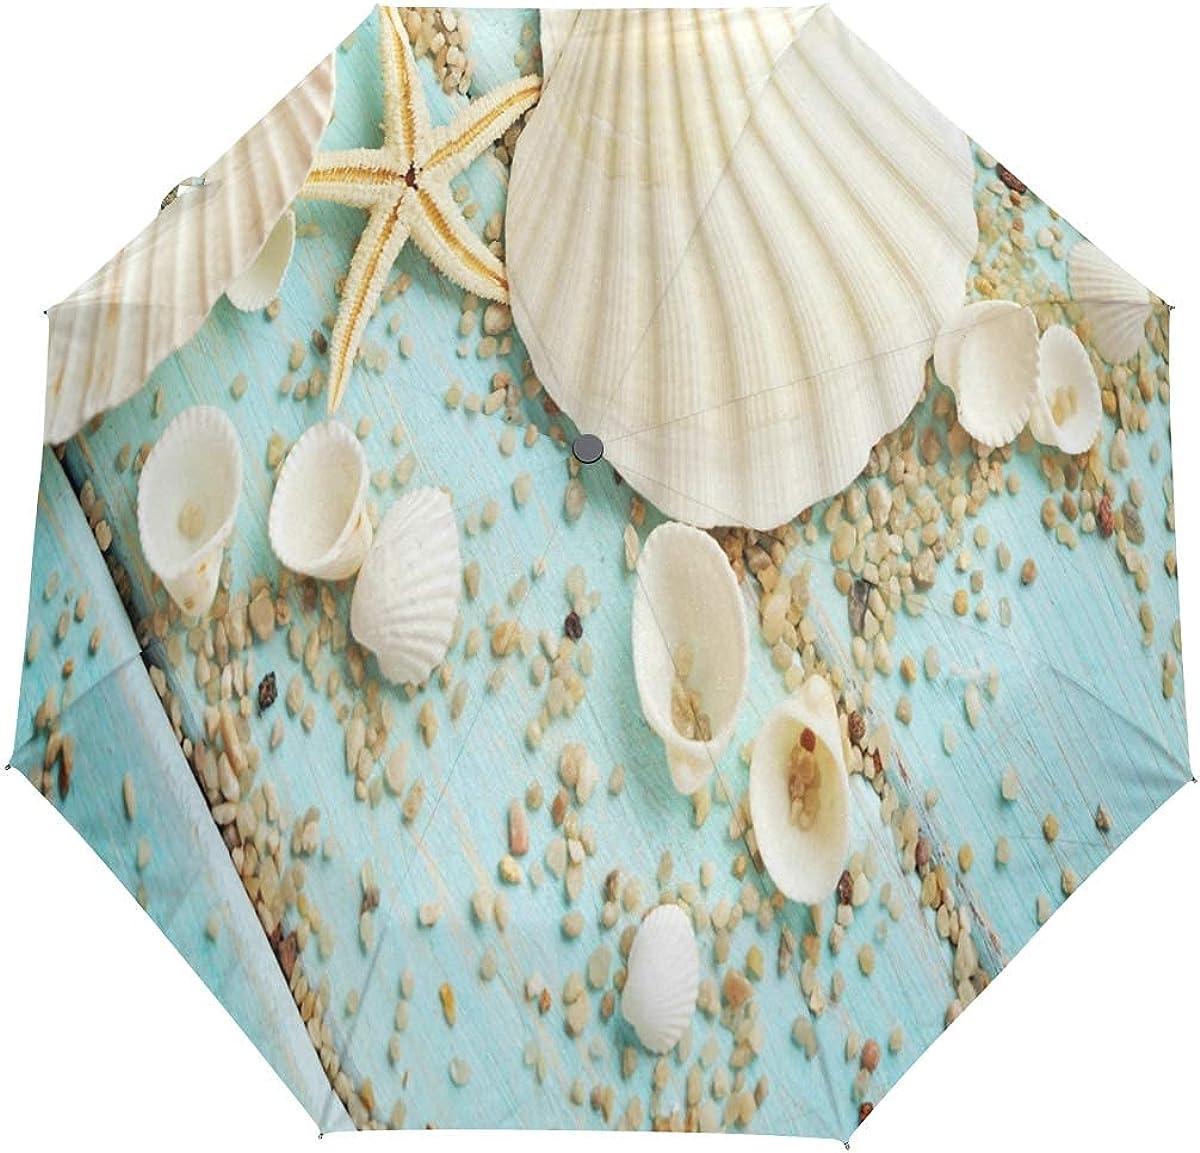 DERTYV 3 Folds Auto Cash special price Open Close Umbrella Summer Max 81% OFF Seashell Wi Beach